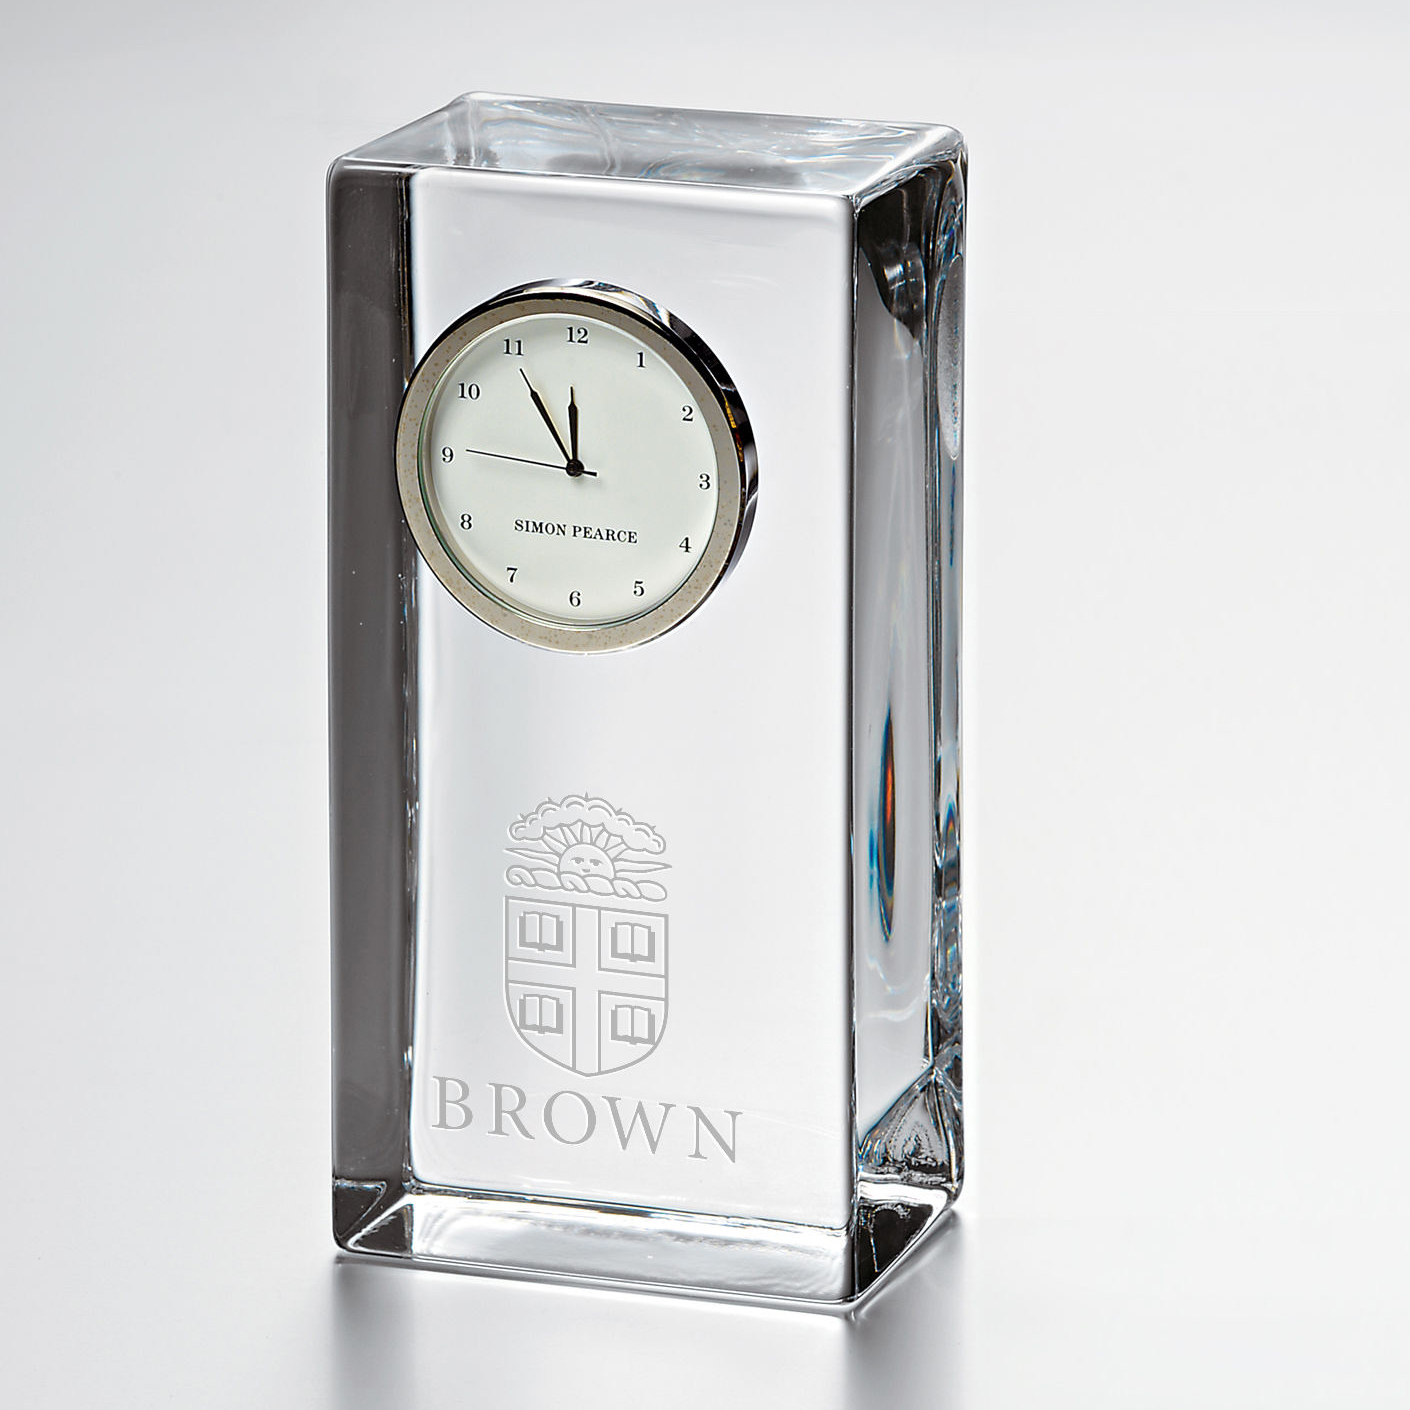 Brown Tall Desk Clock by Simon Pearce